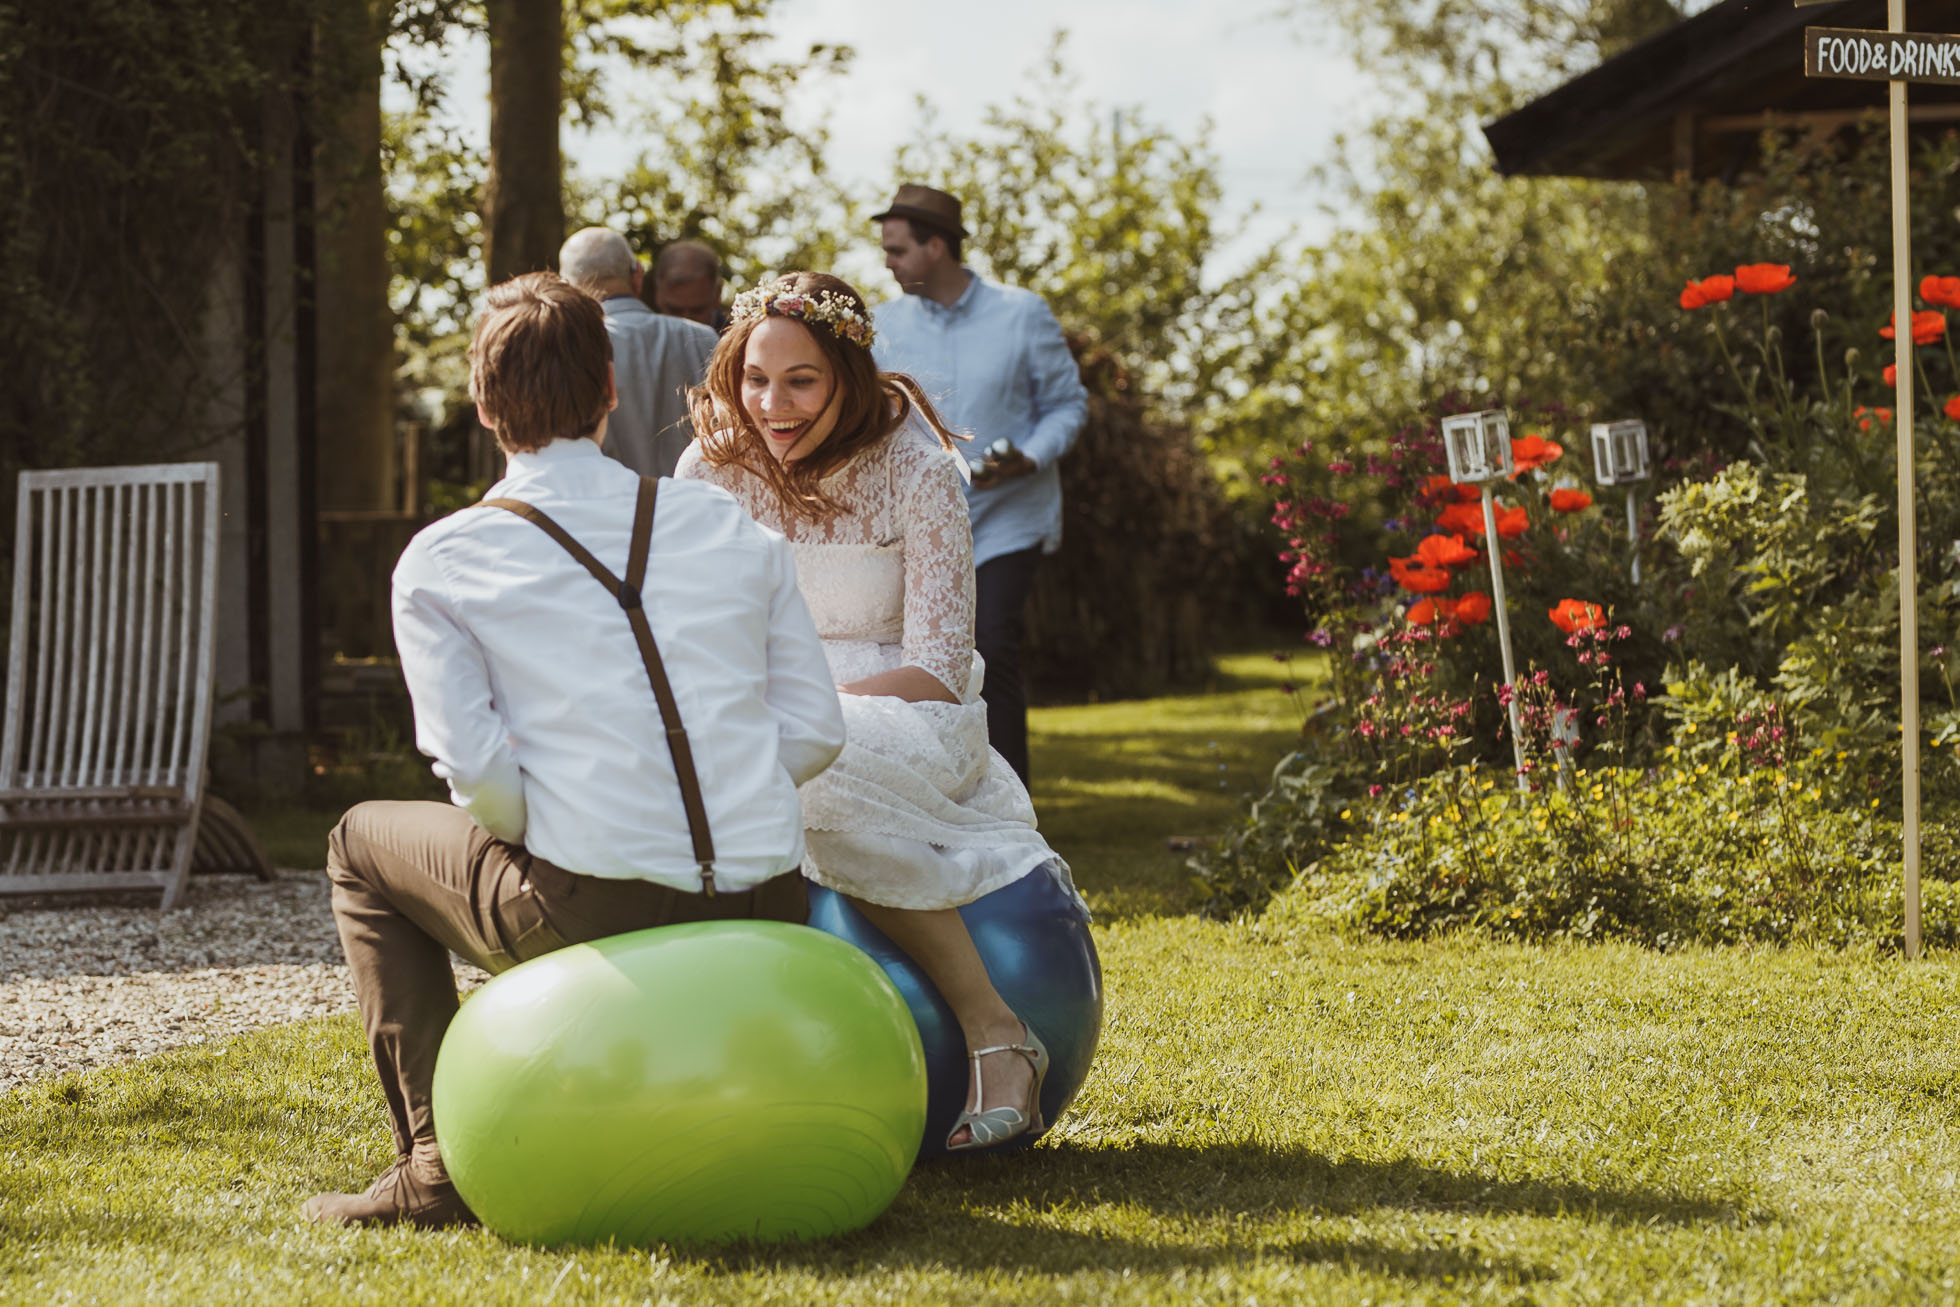 utrecht-wedding-photographer-109.jpg